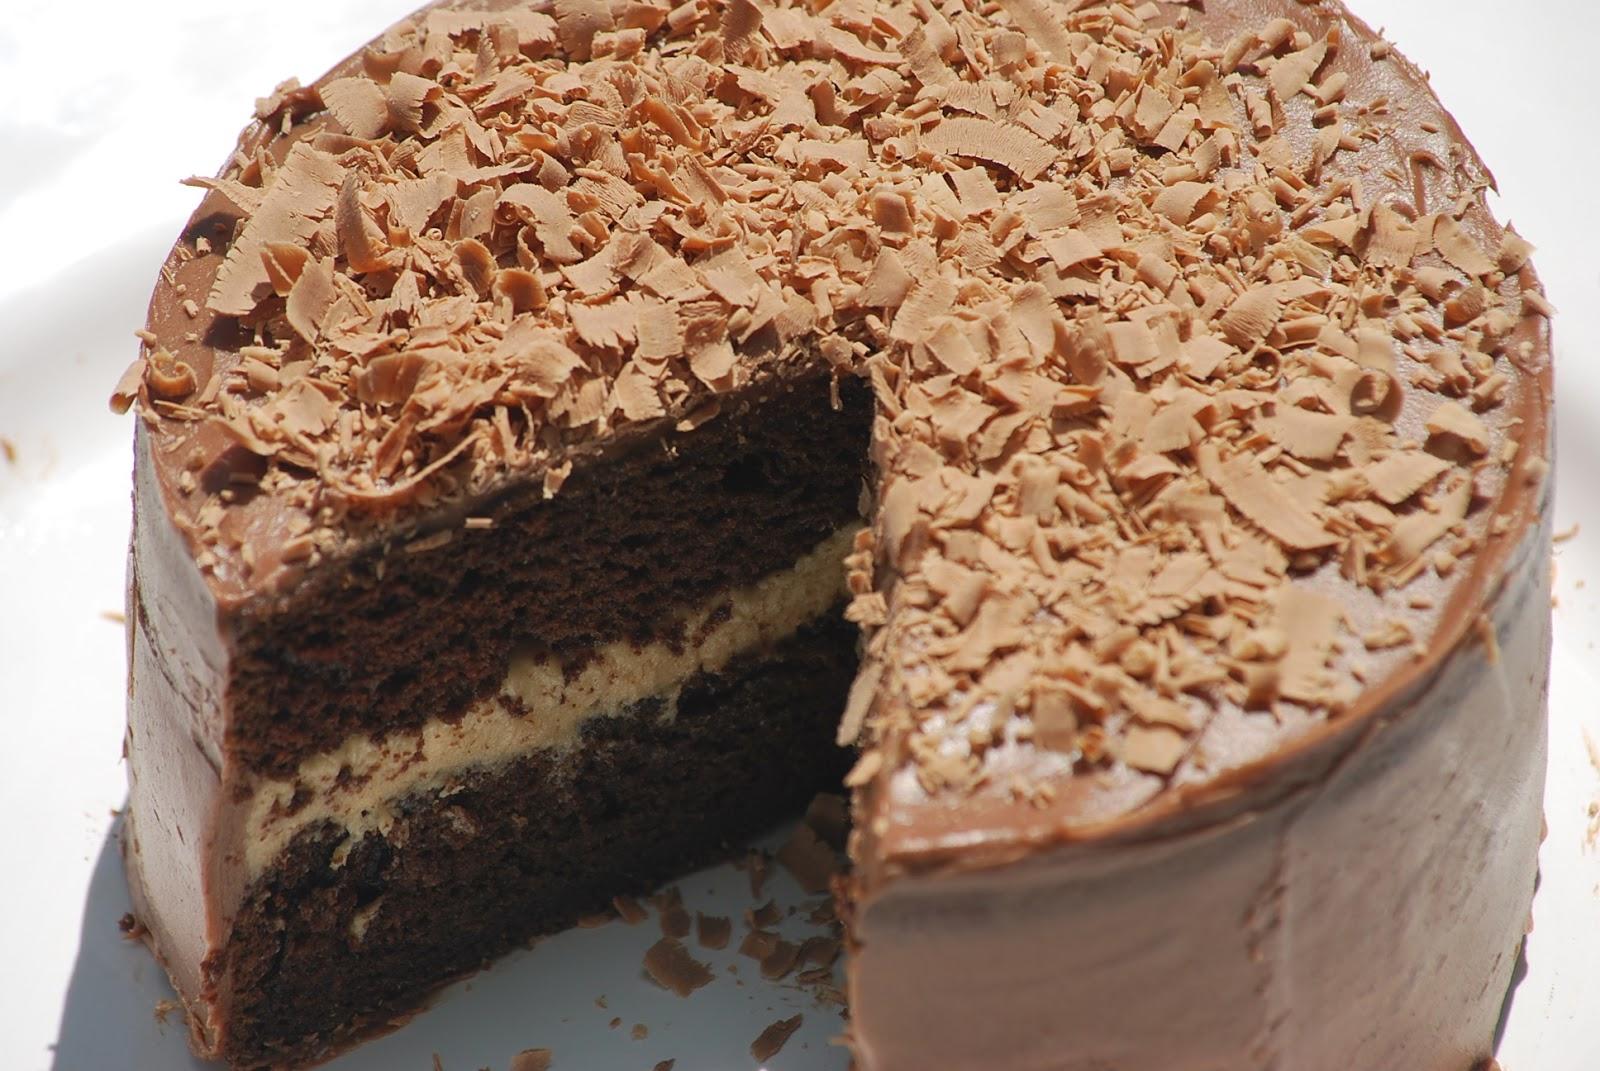 Cake Recipes Dairy Free: My Story In Recipes: Gluten Free Chocolate Cake